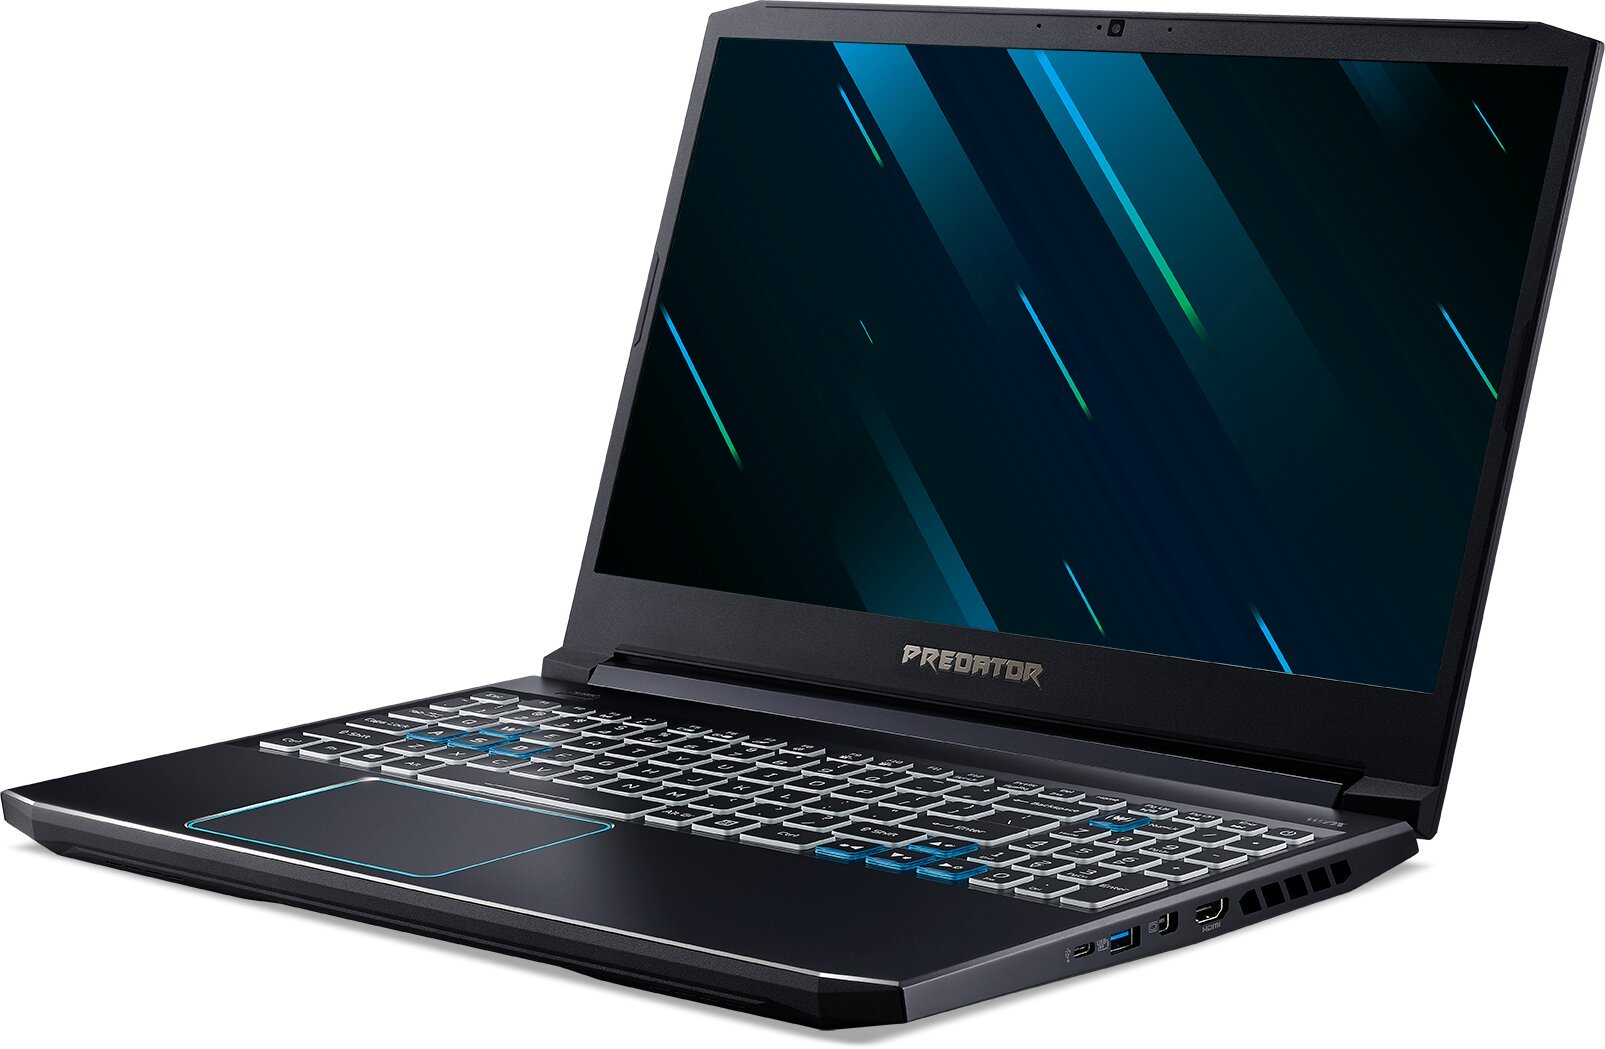 Acer Predator Helios 300 PH315-52-77D4